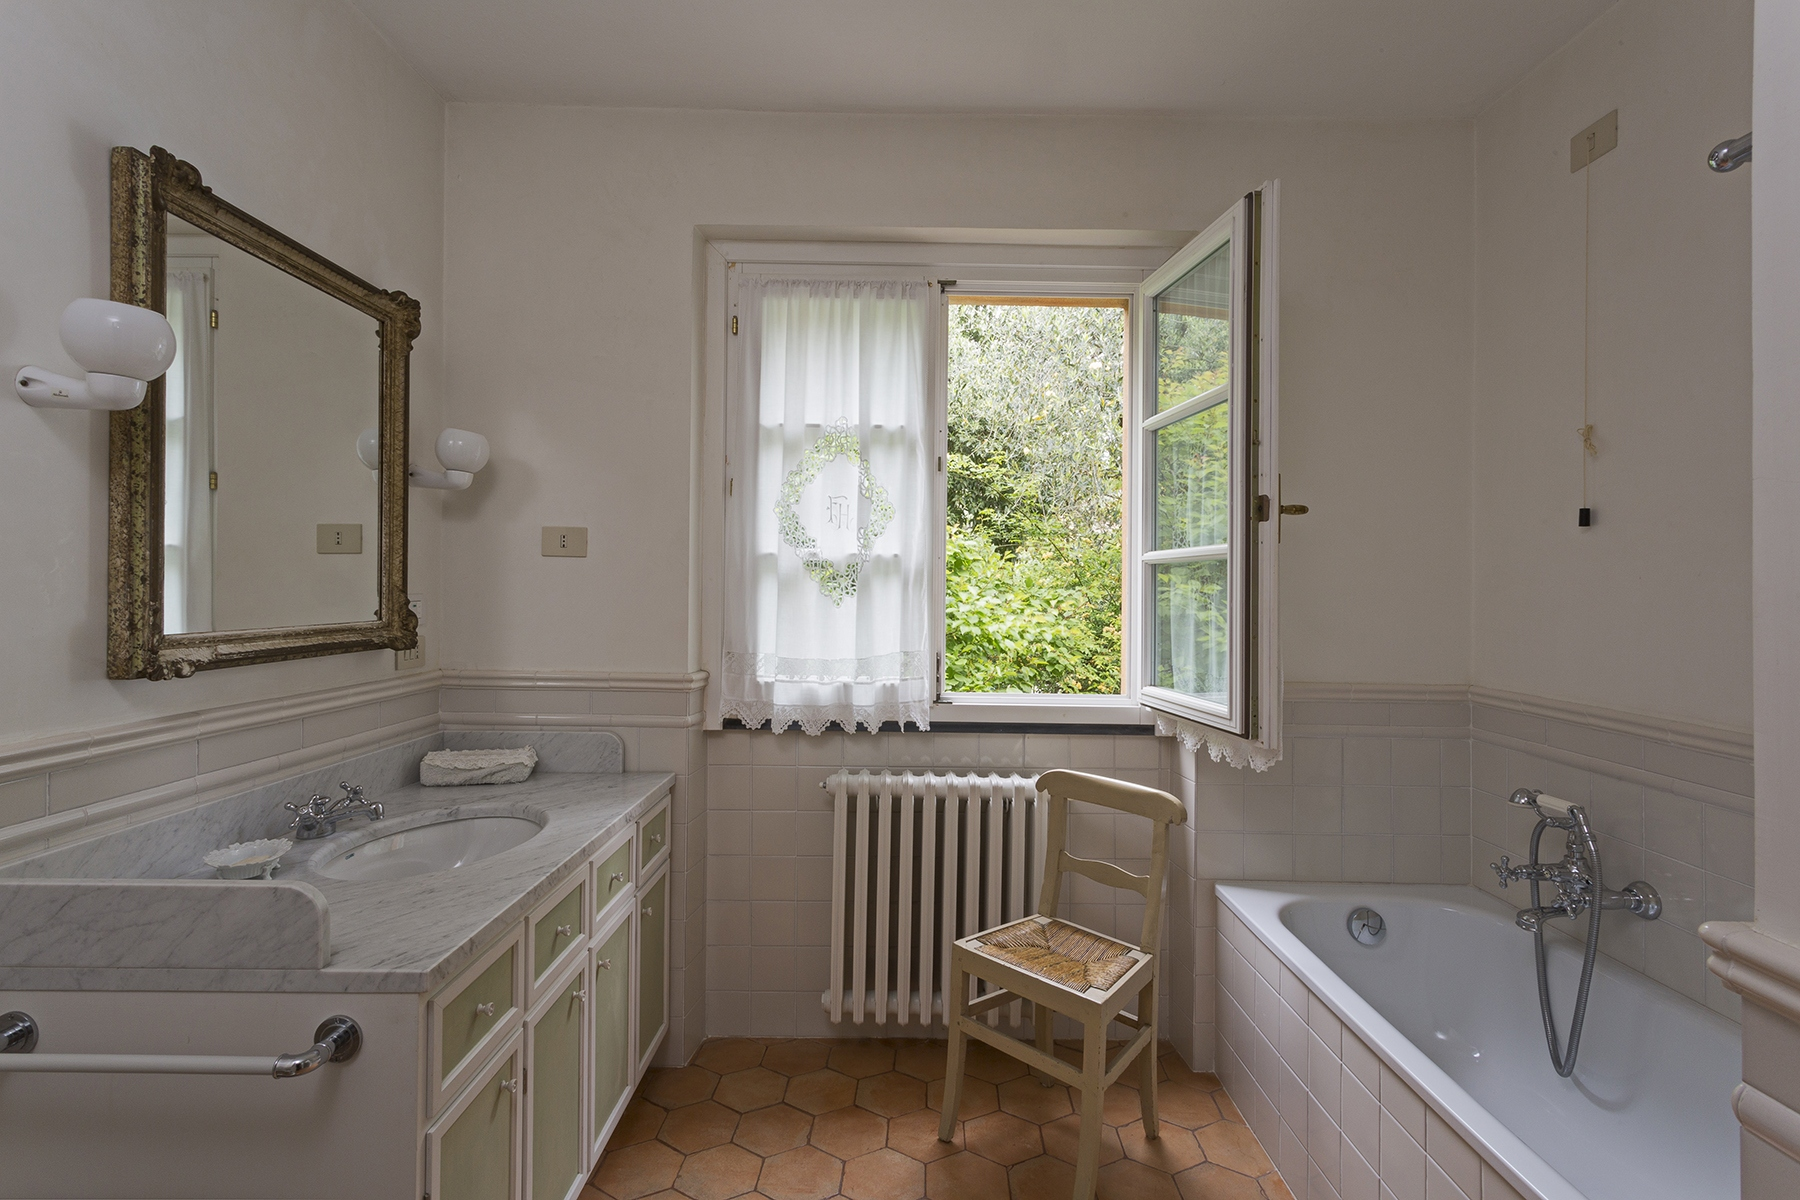 Villa in Vendita a Santa Margherita Ligure: 5 locali, 580 mq - Foto 22